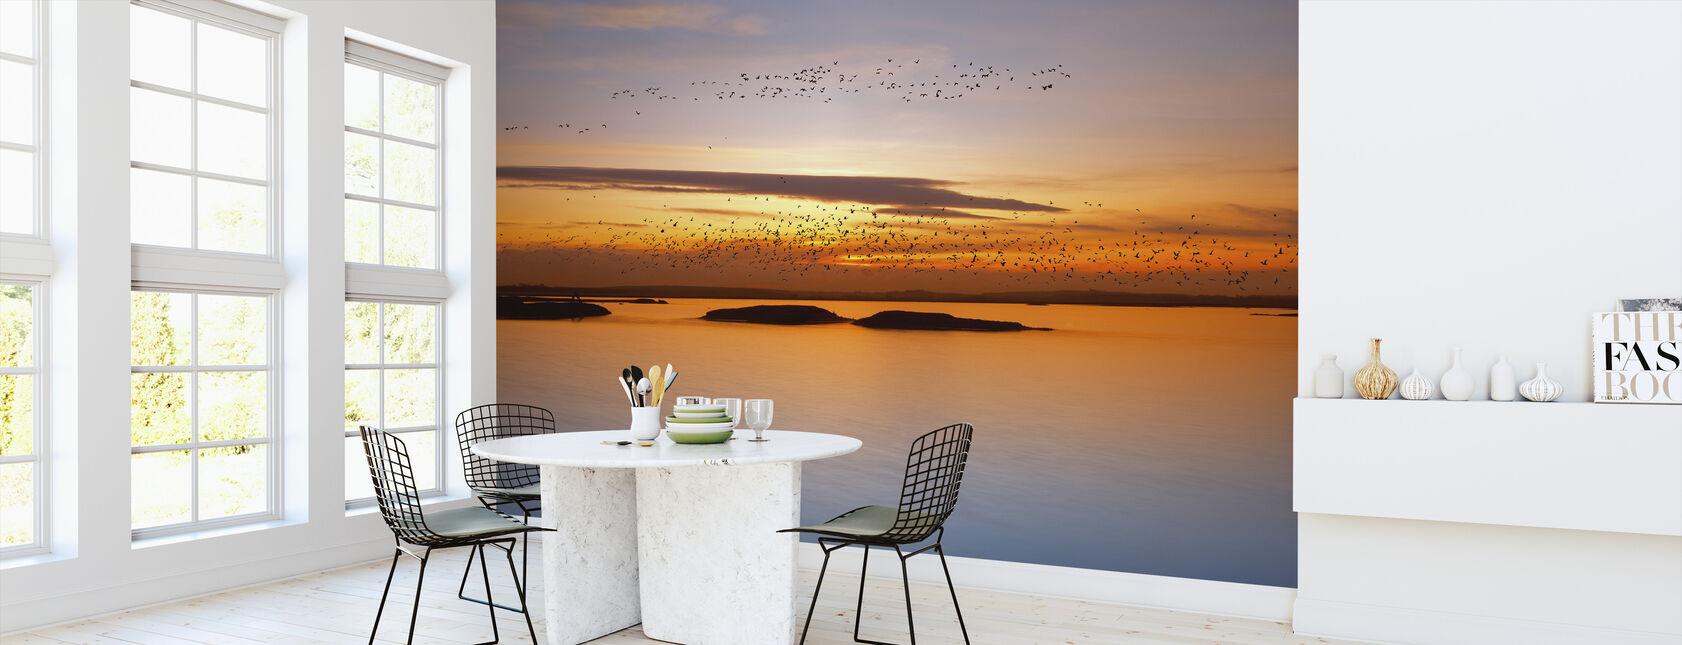 Sunset - Wallpaper - Kitchen